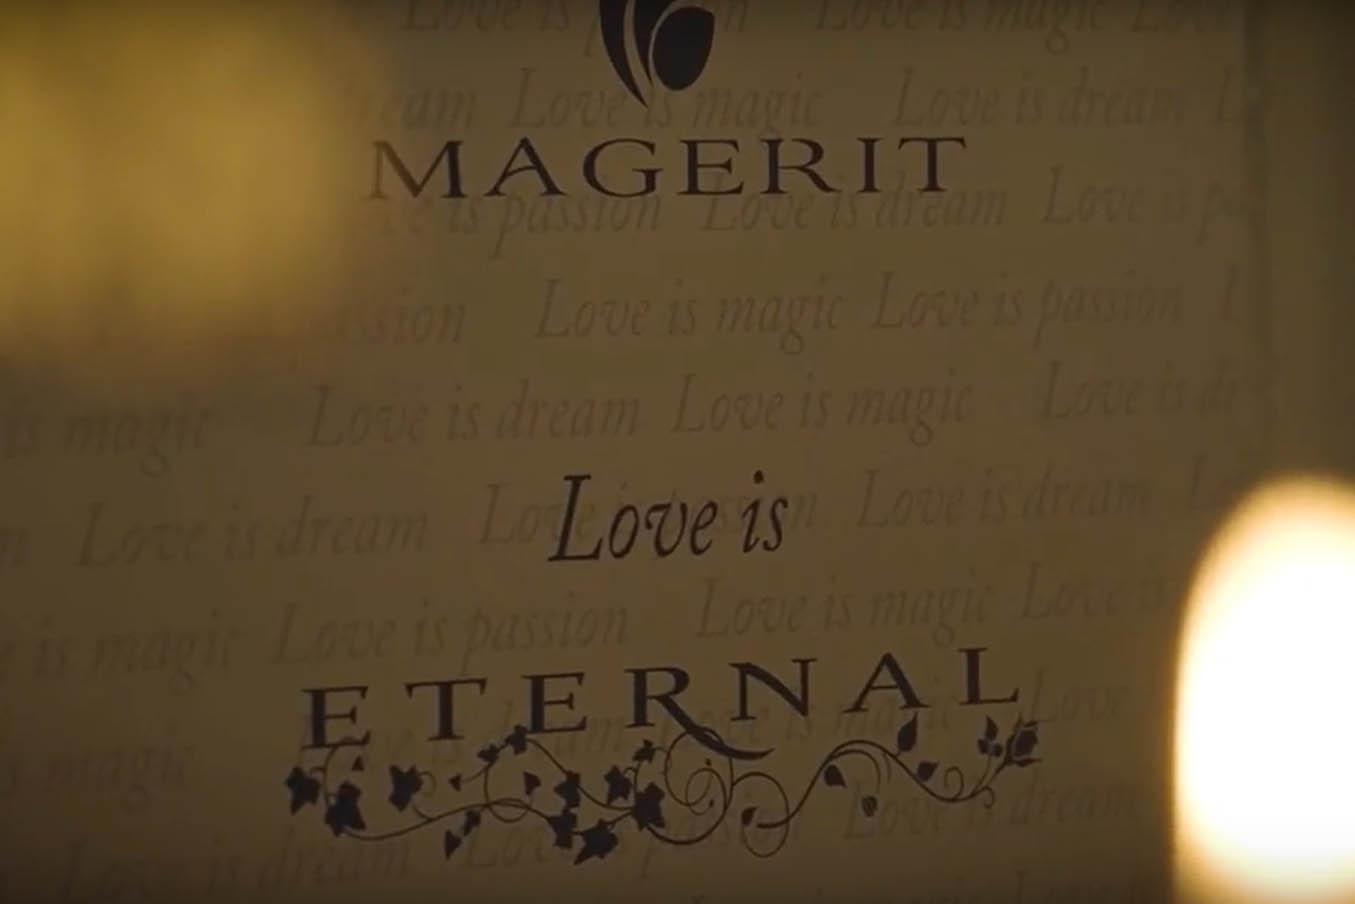 Magerit Joyas - Eternal Love